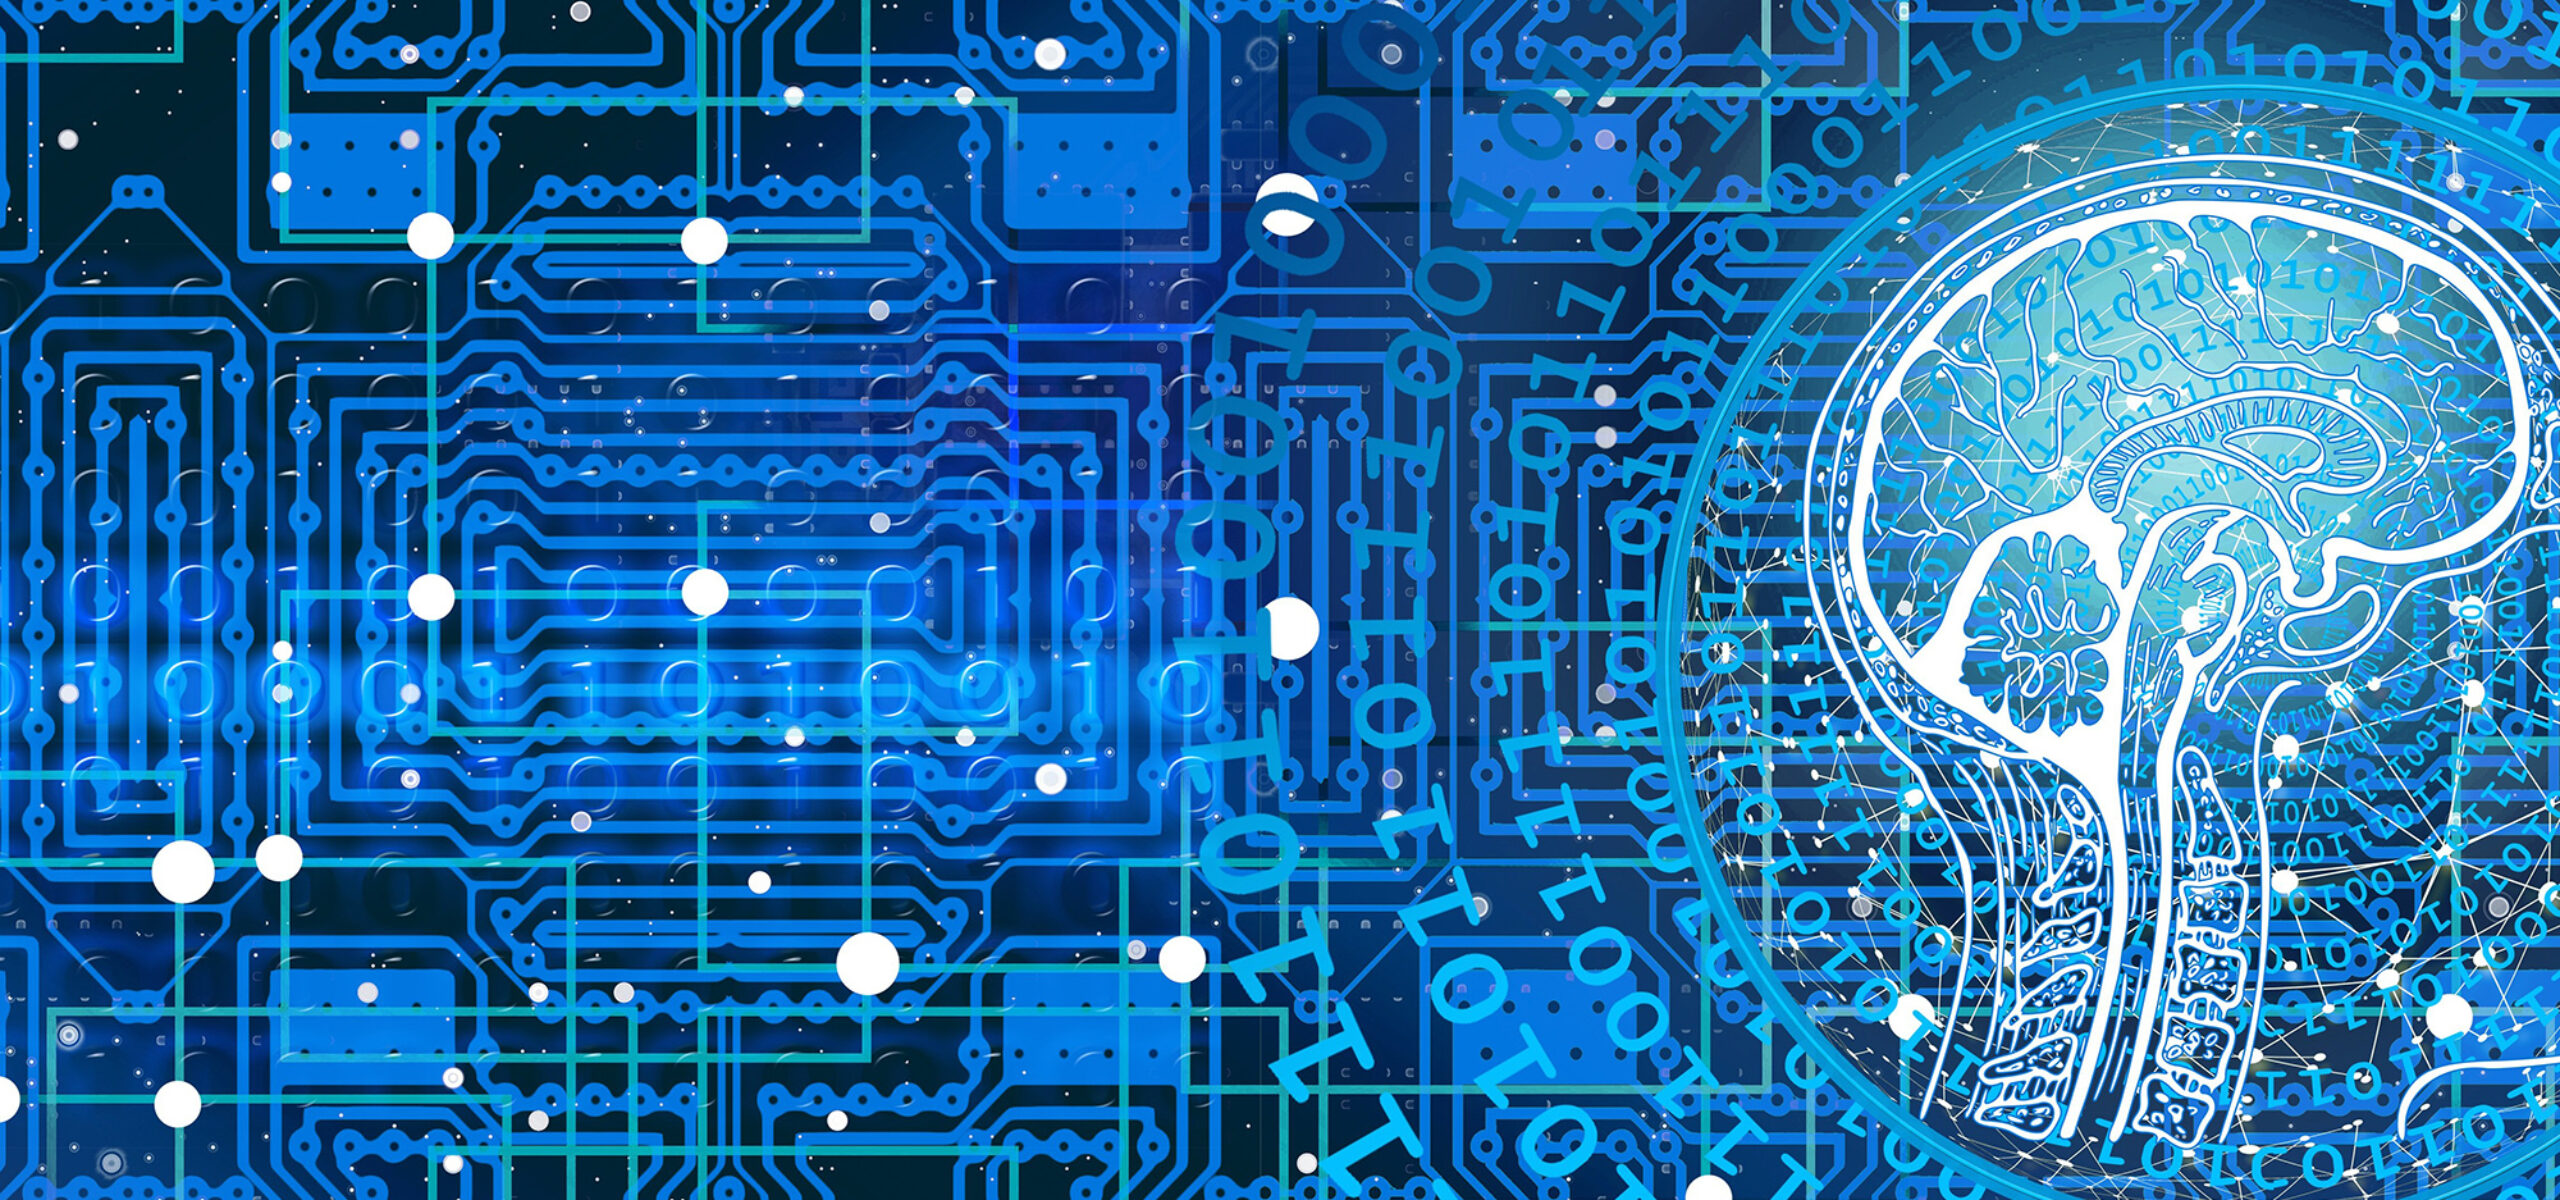 Illustration of big data, coding and machine learning